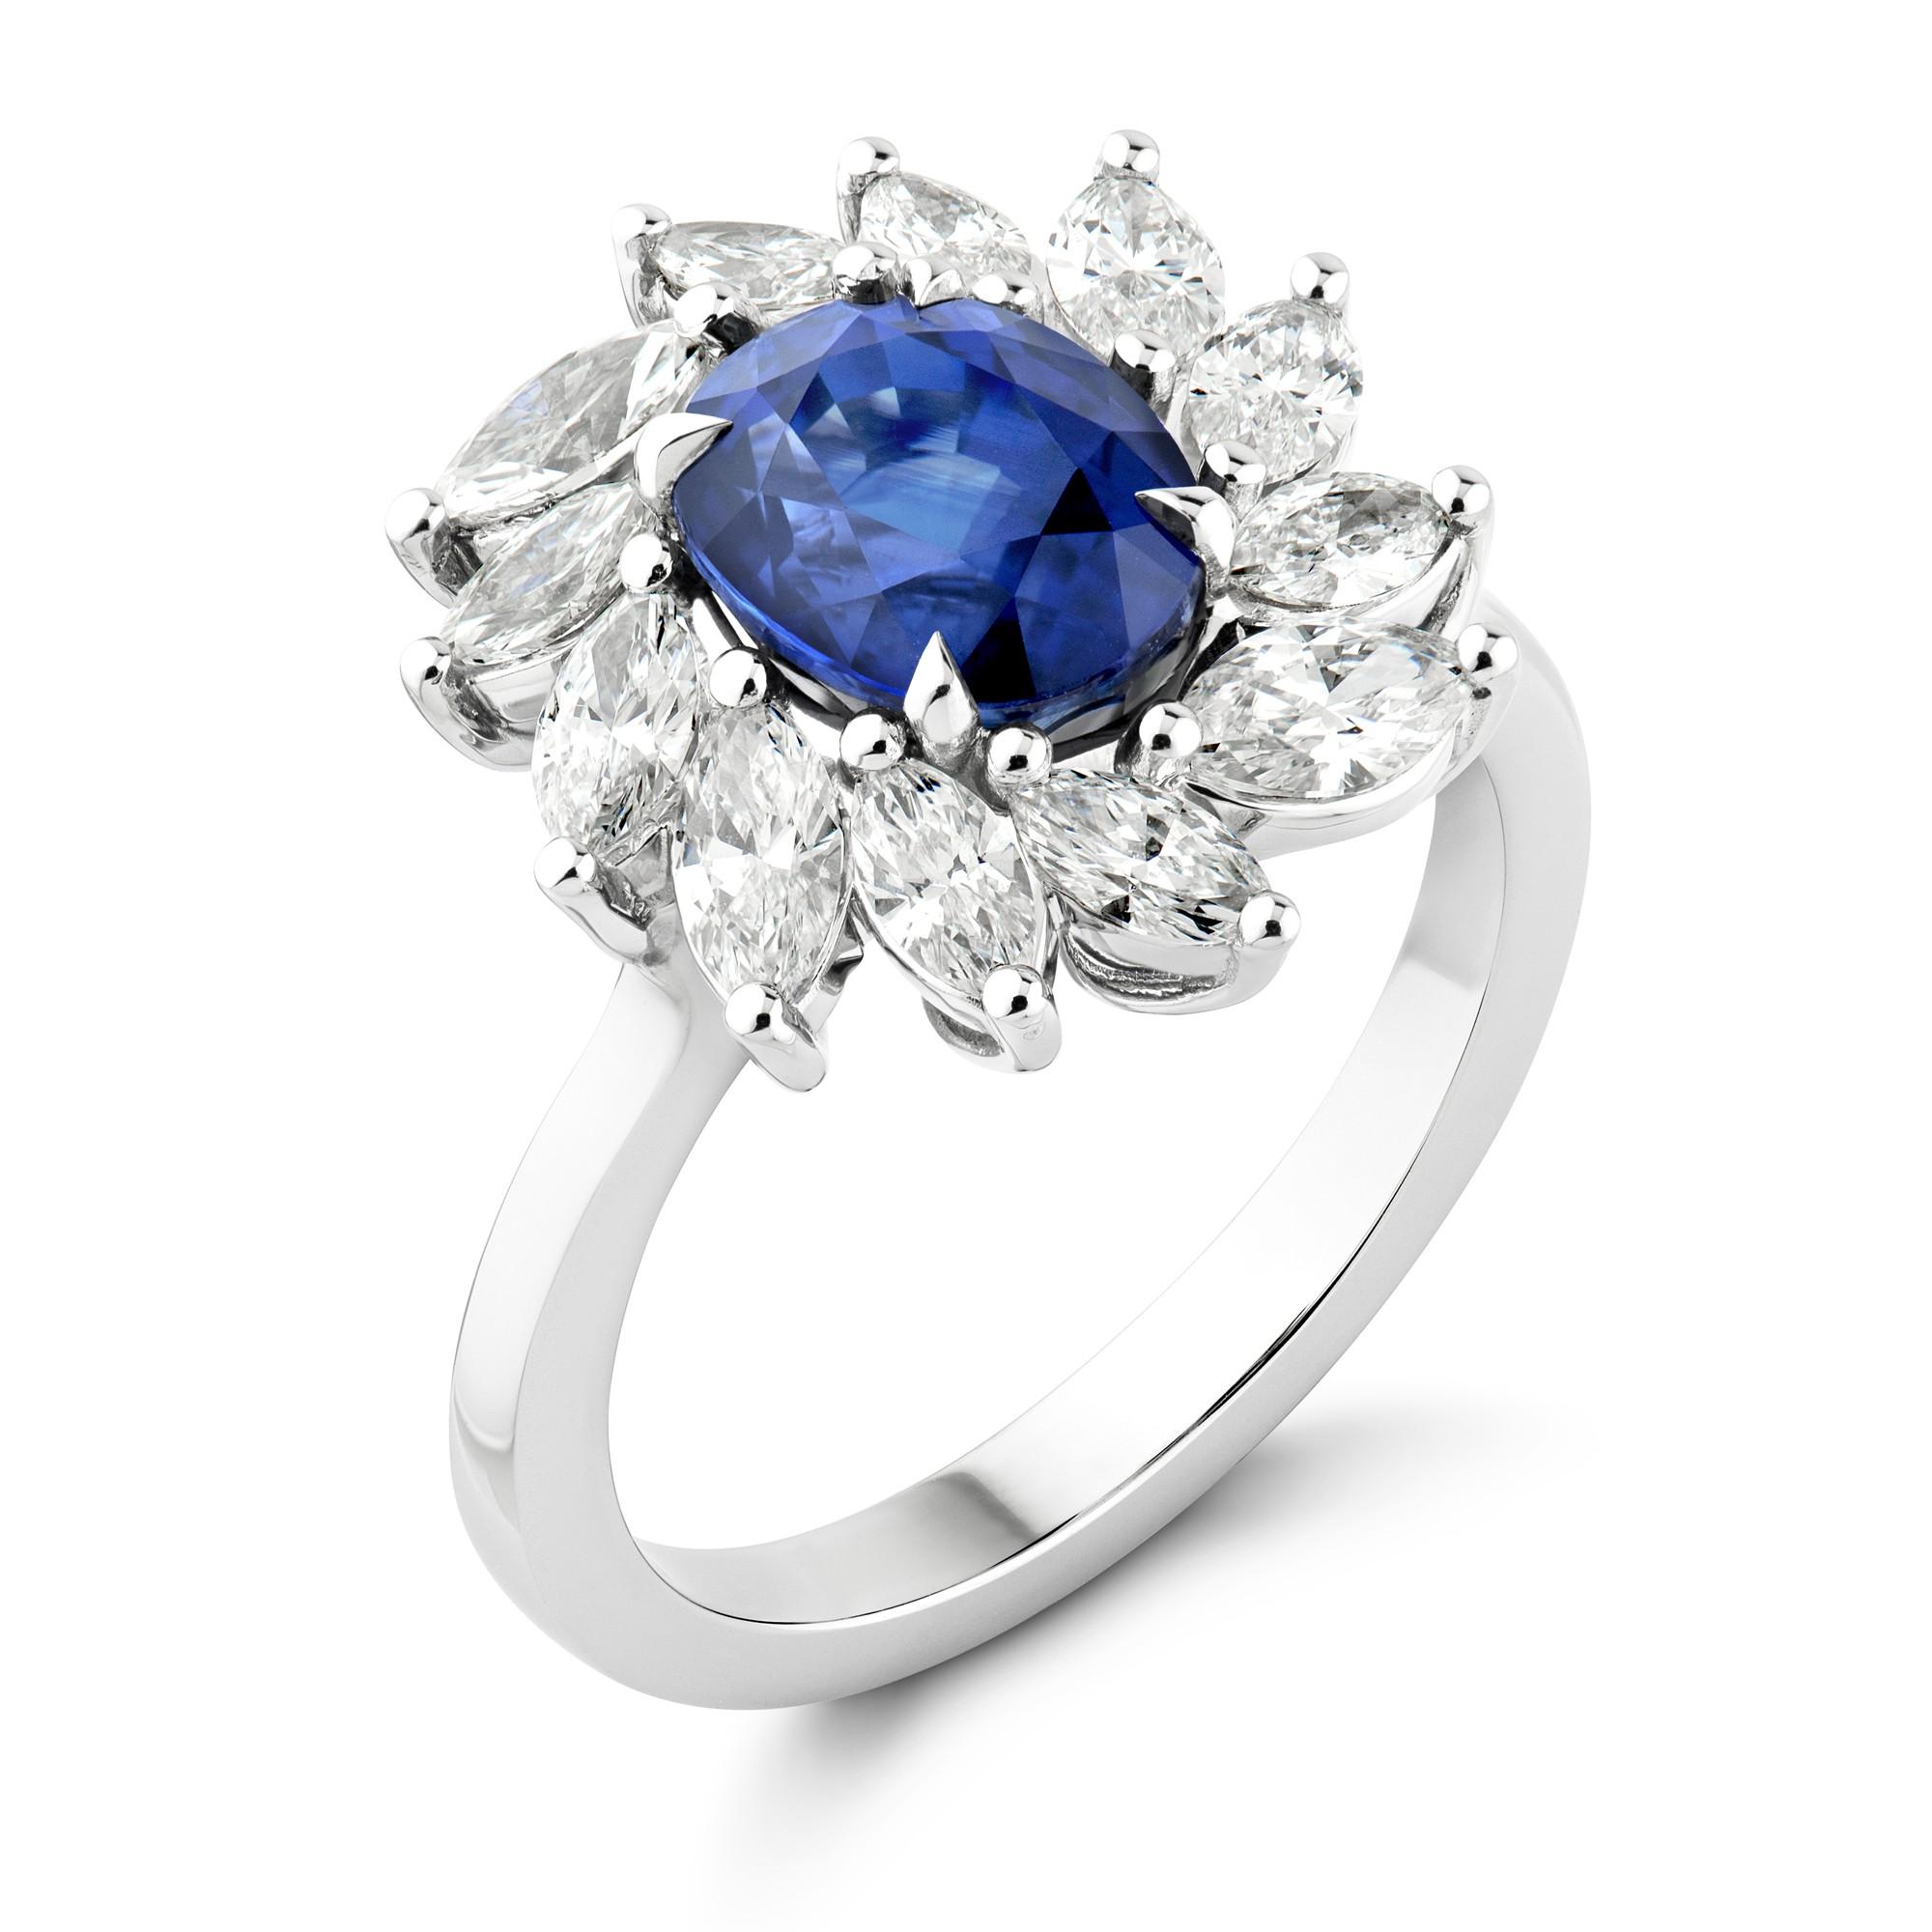 An Oval Cut Sapphire & Diamond Cluster